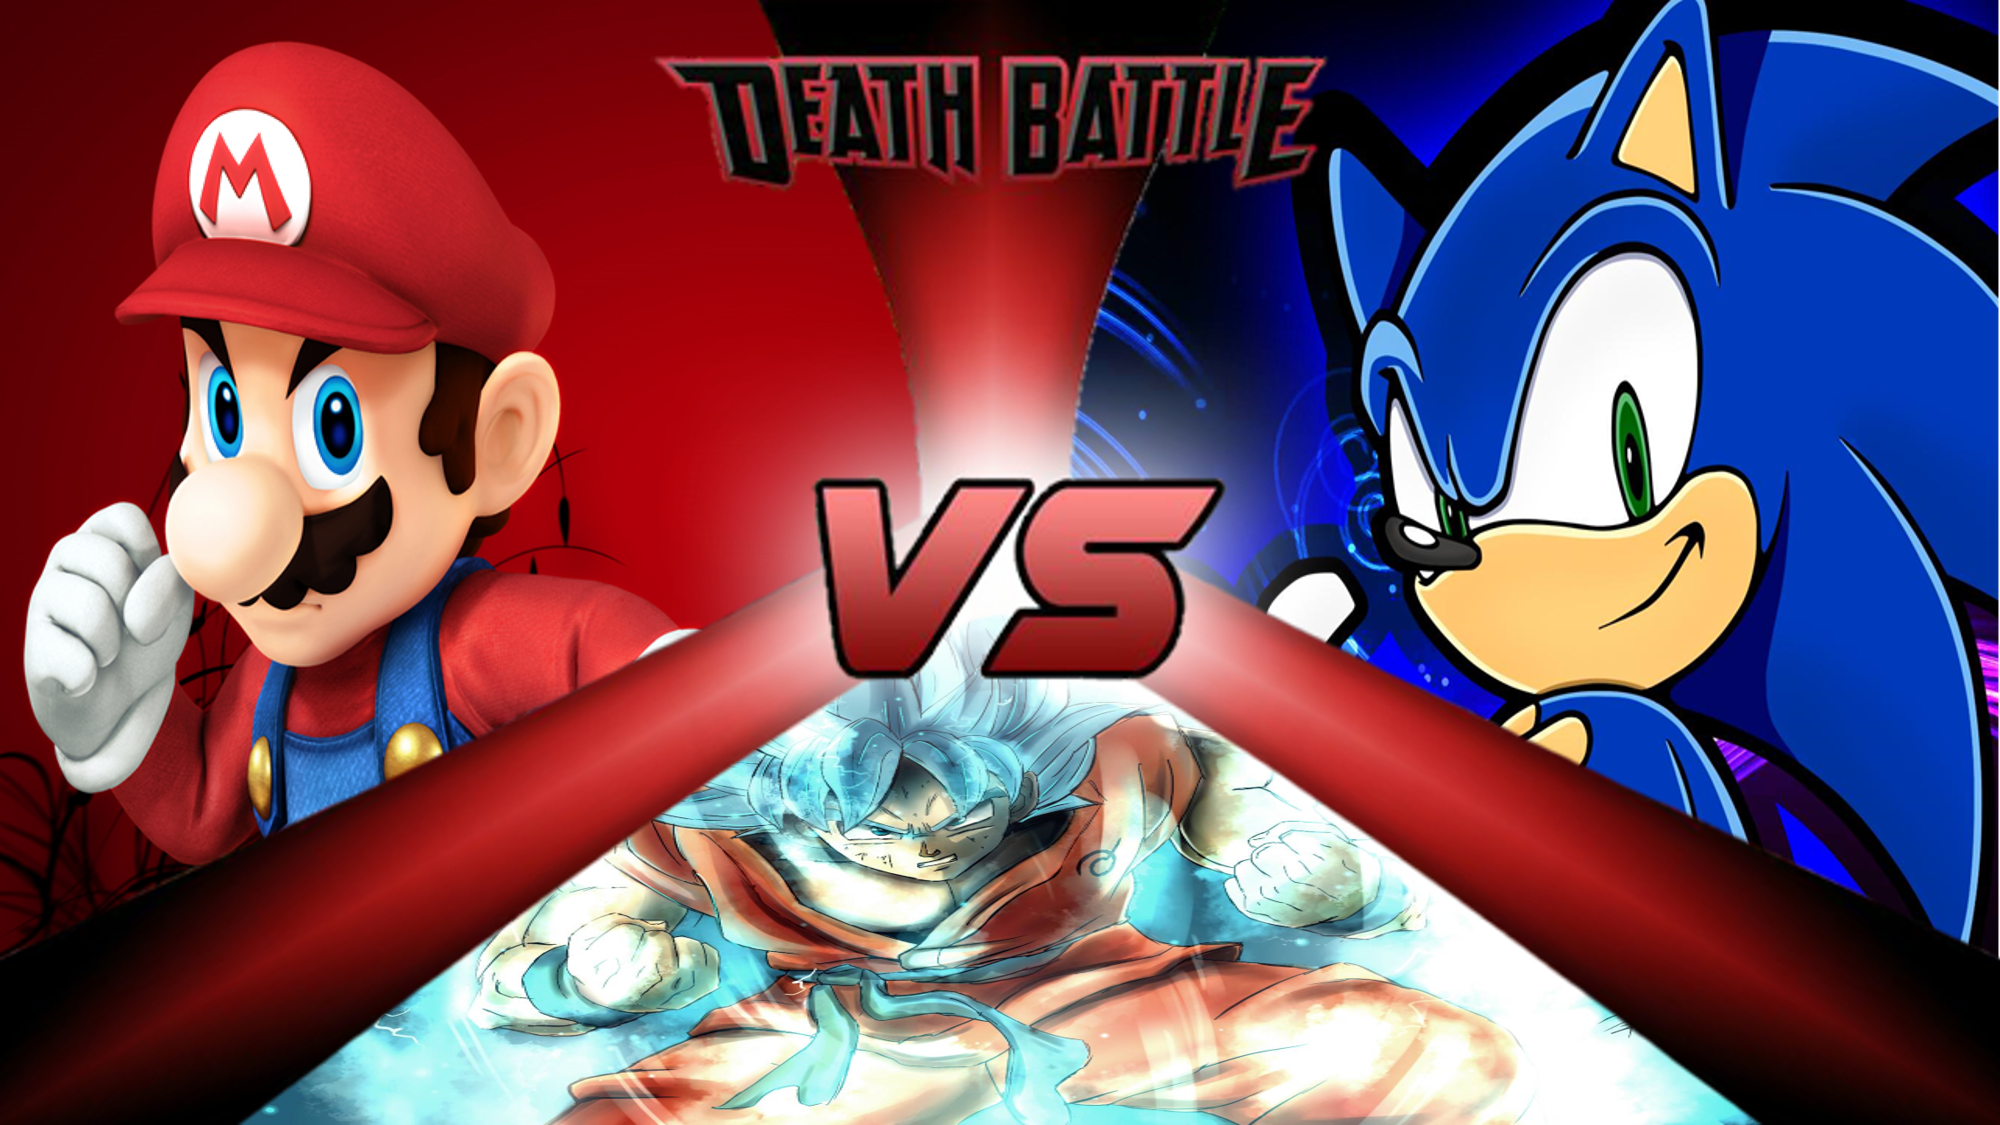 Mario Vs Goku Vs Sonic Death Battle Fanon Wiki Fandom Powered By